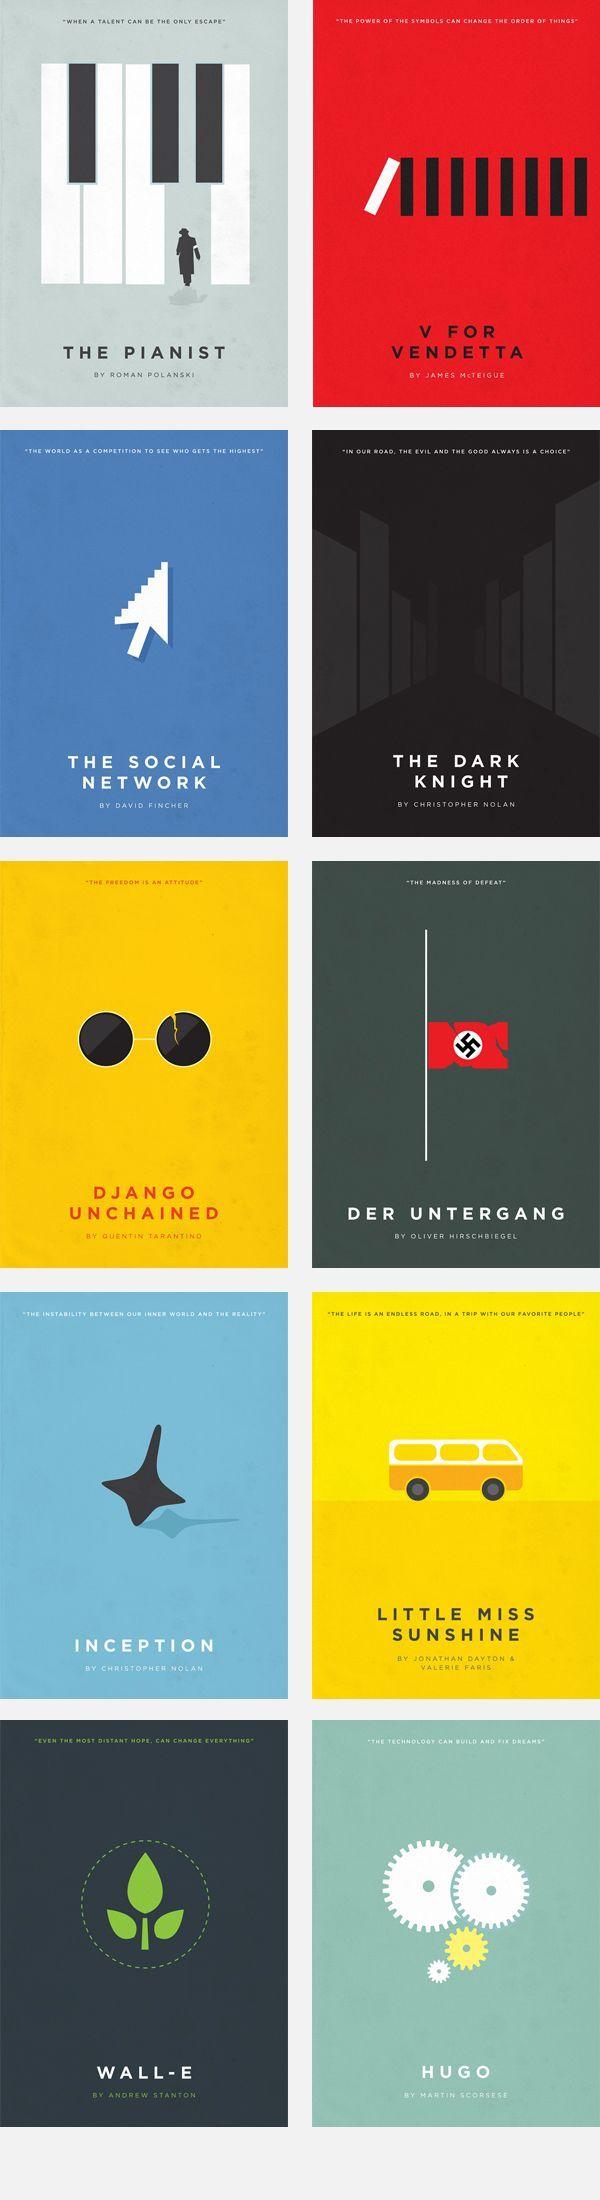 Minimalist Classroom Worksheets : Best ideas about superhero font on pinterest